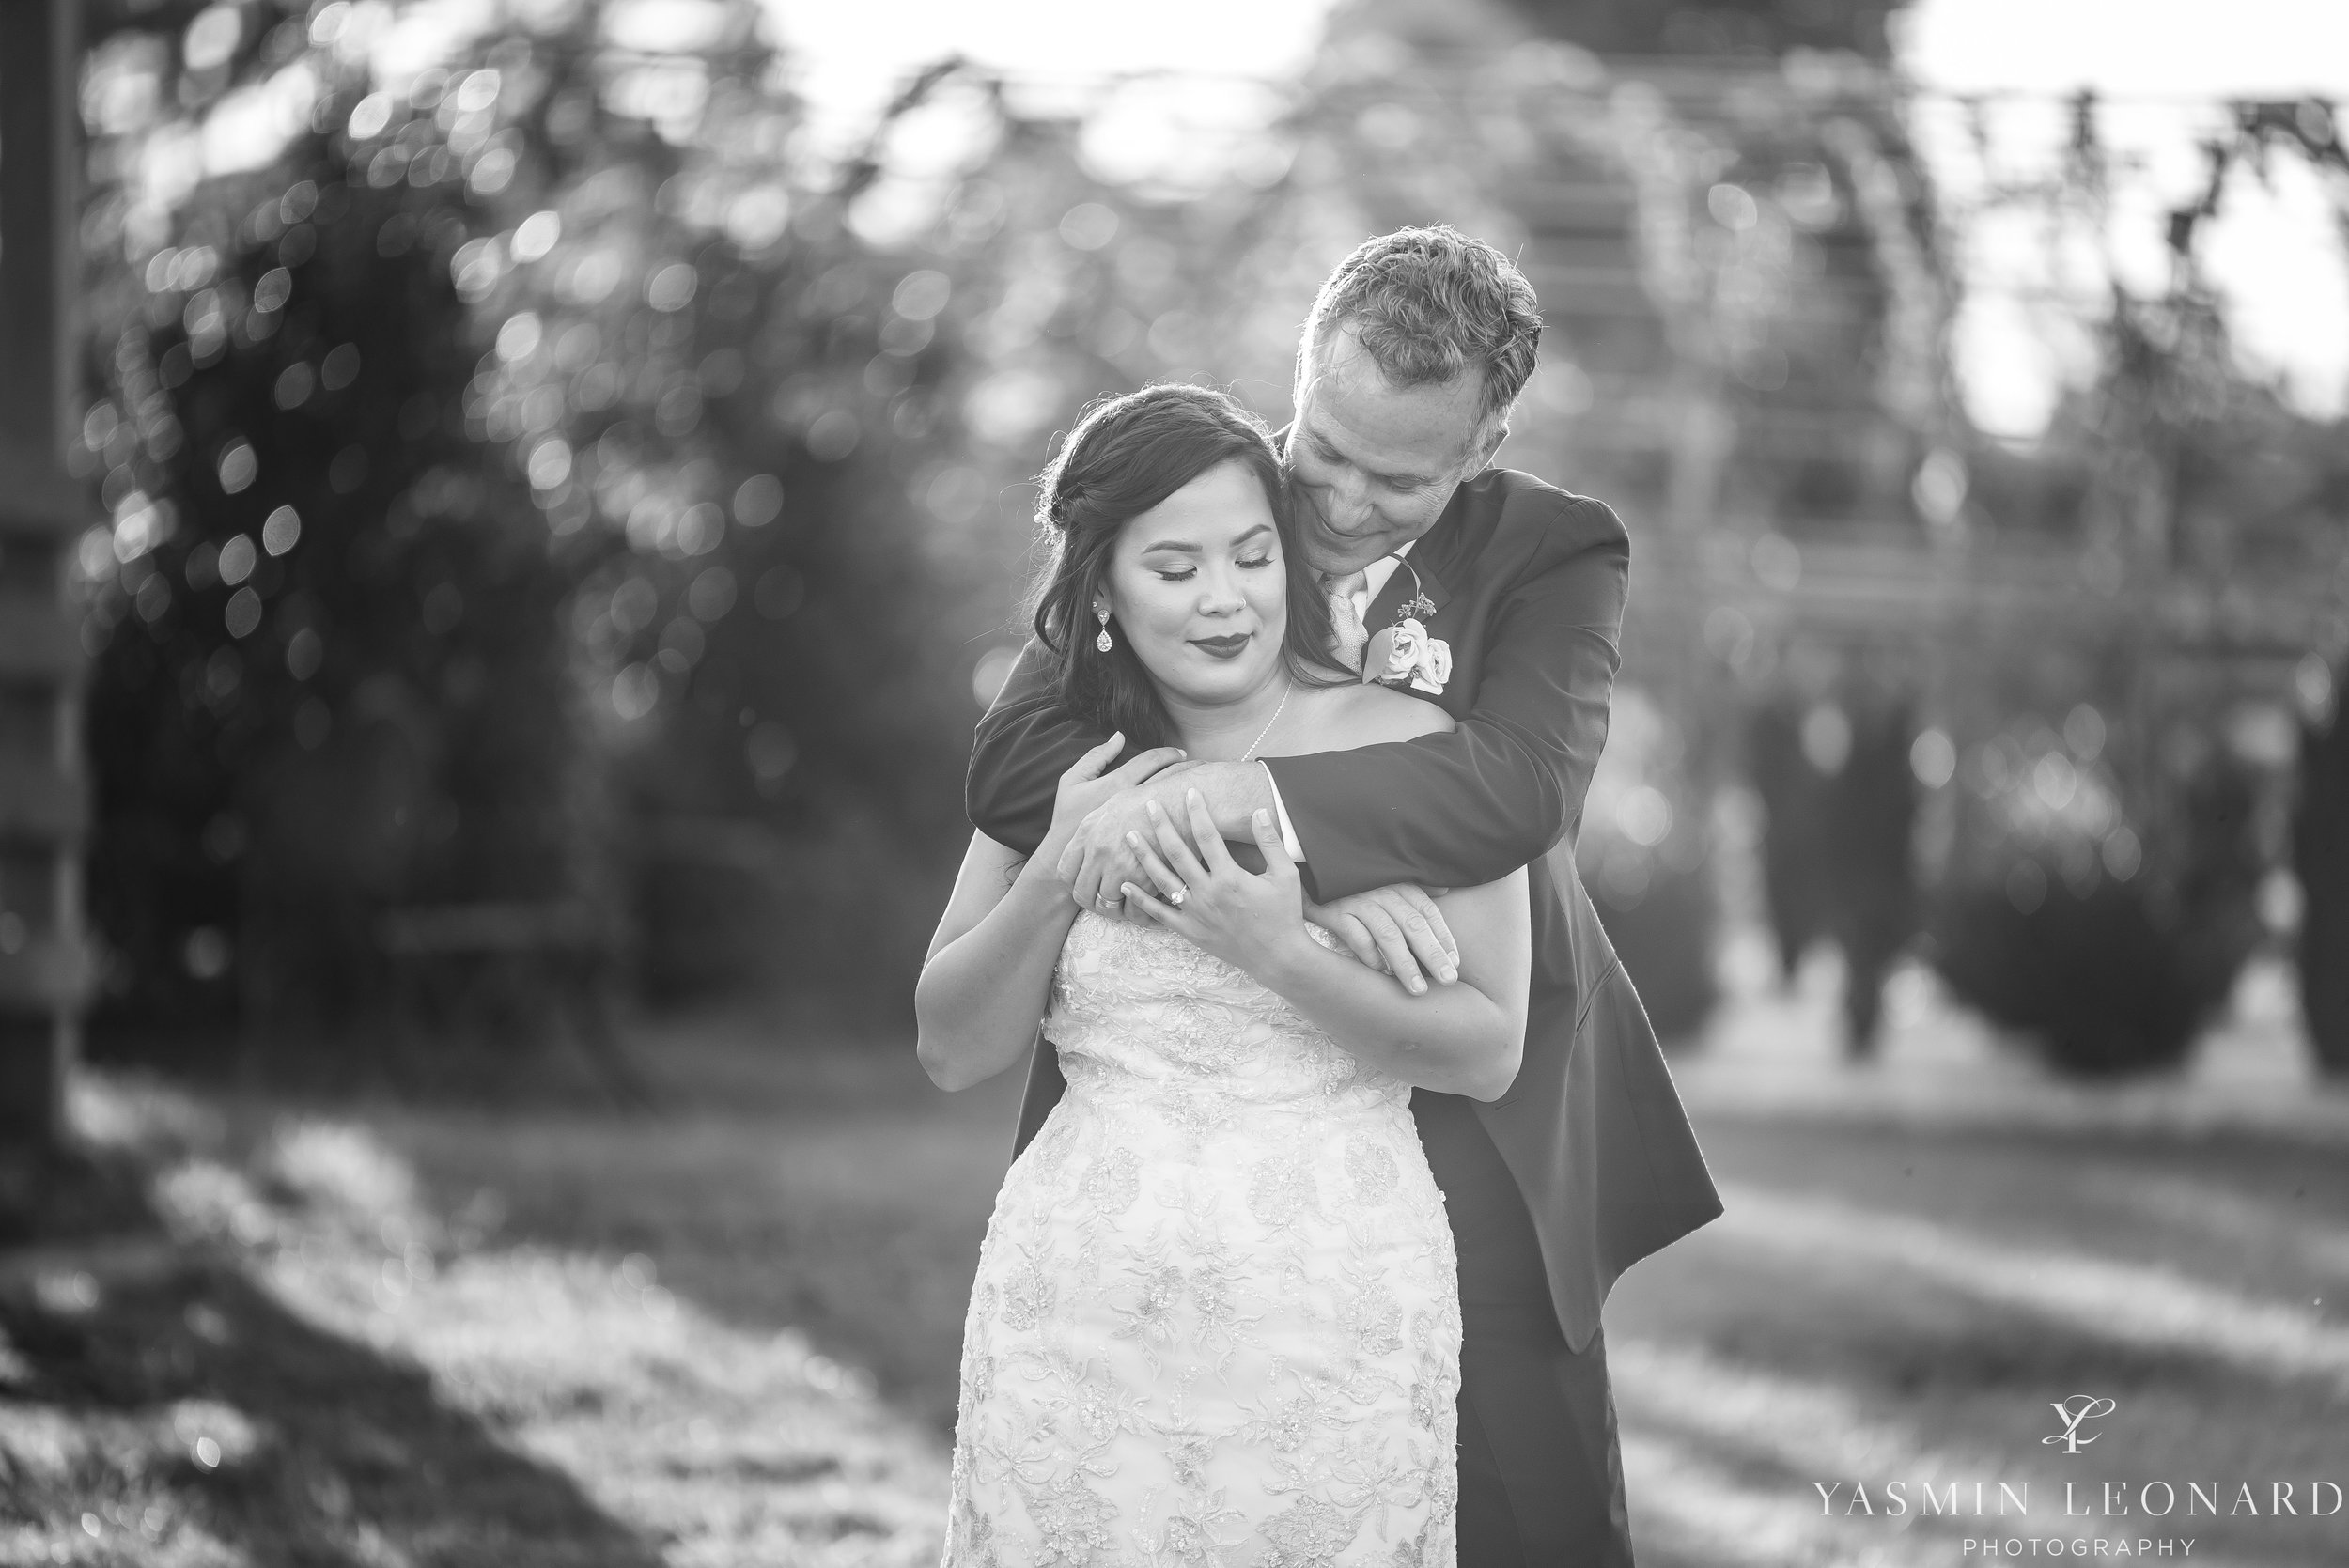 Mason Ridge   Liberty, NC   Aylissa and John   Yasmin Leonard Photography-67.jpg